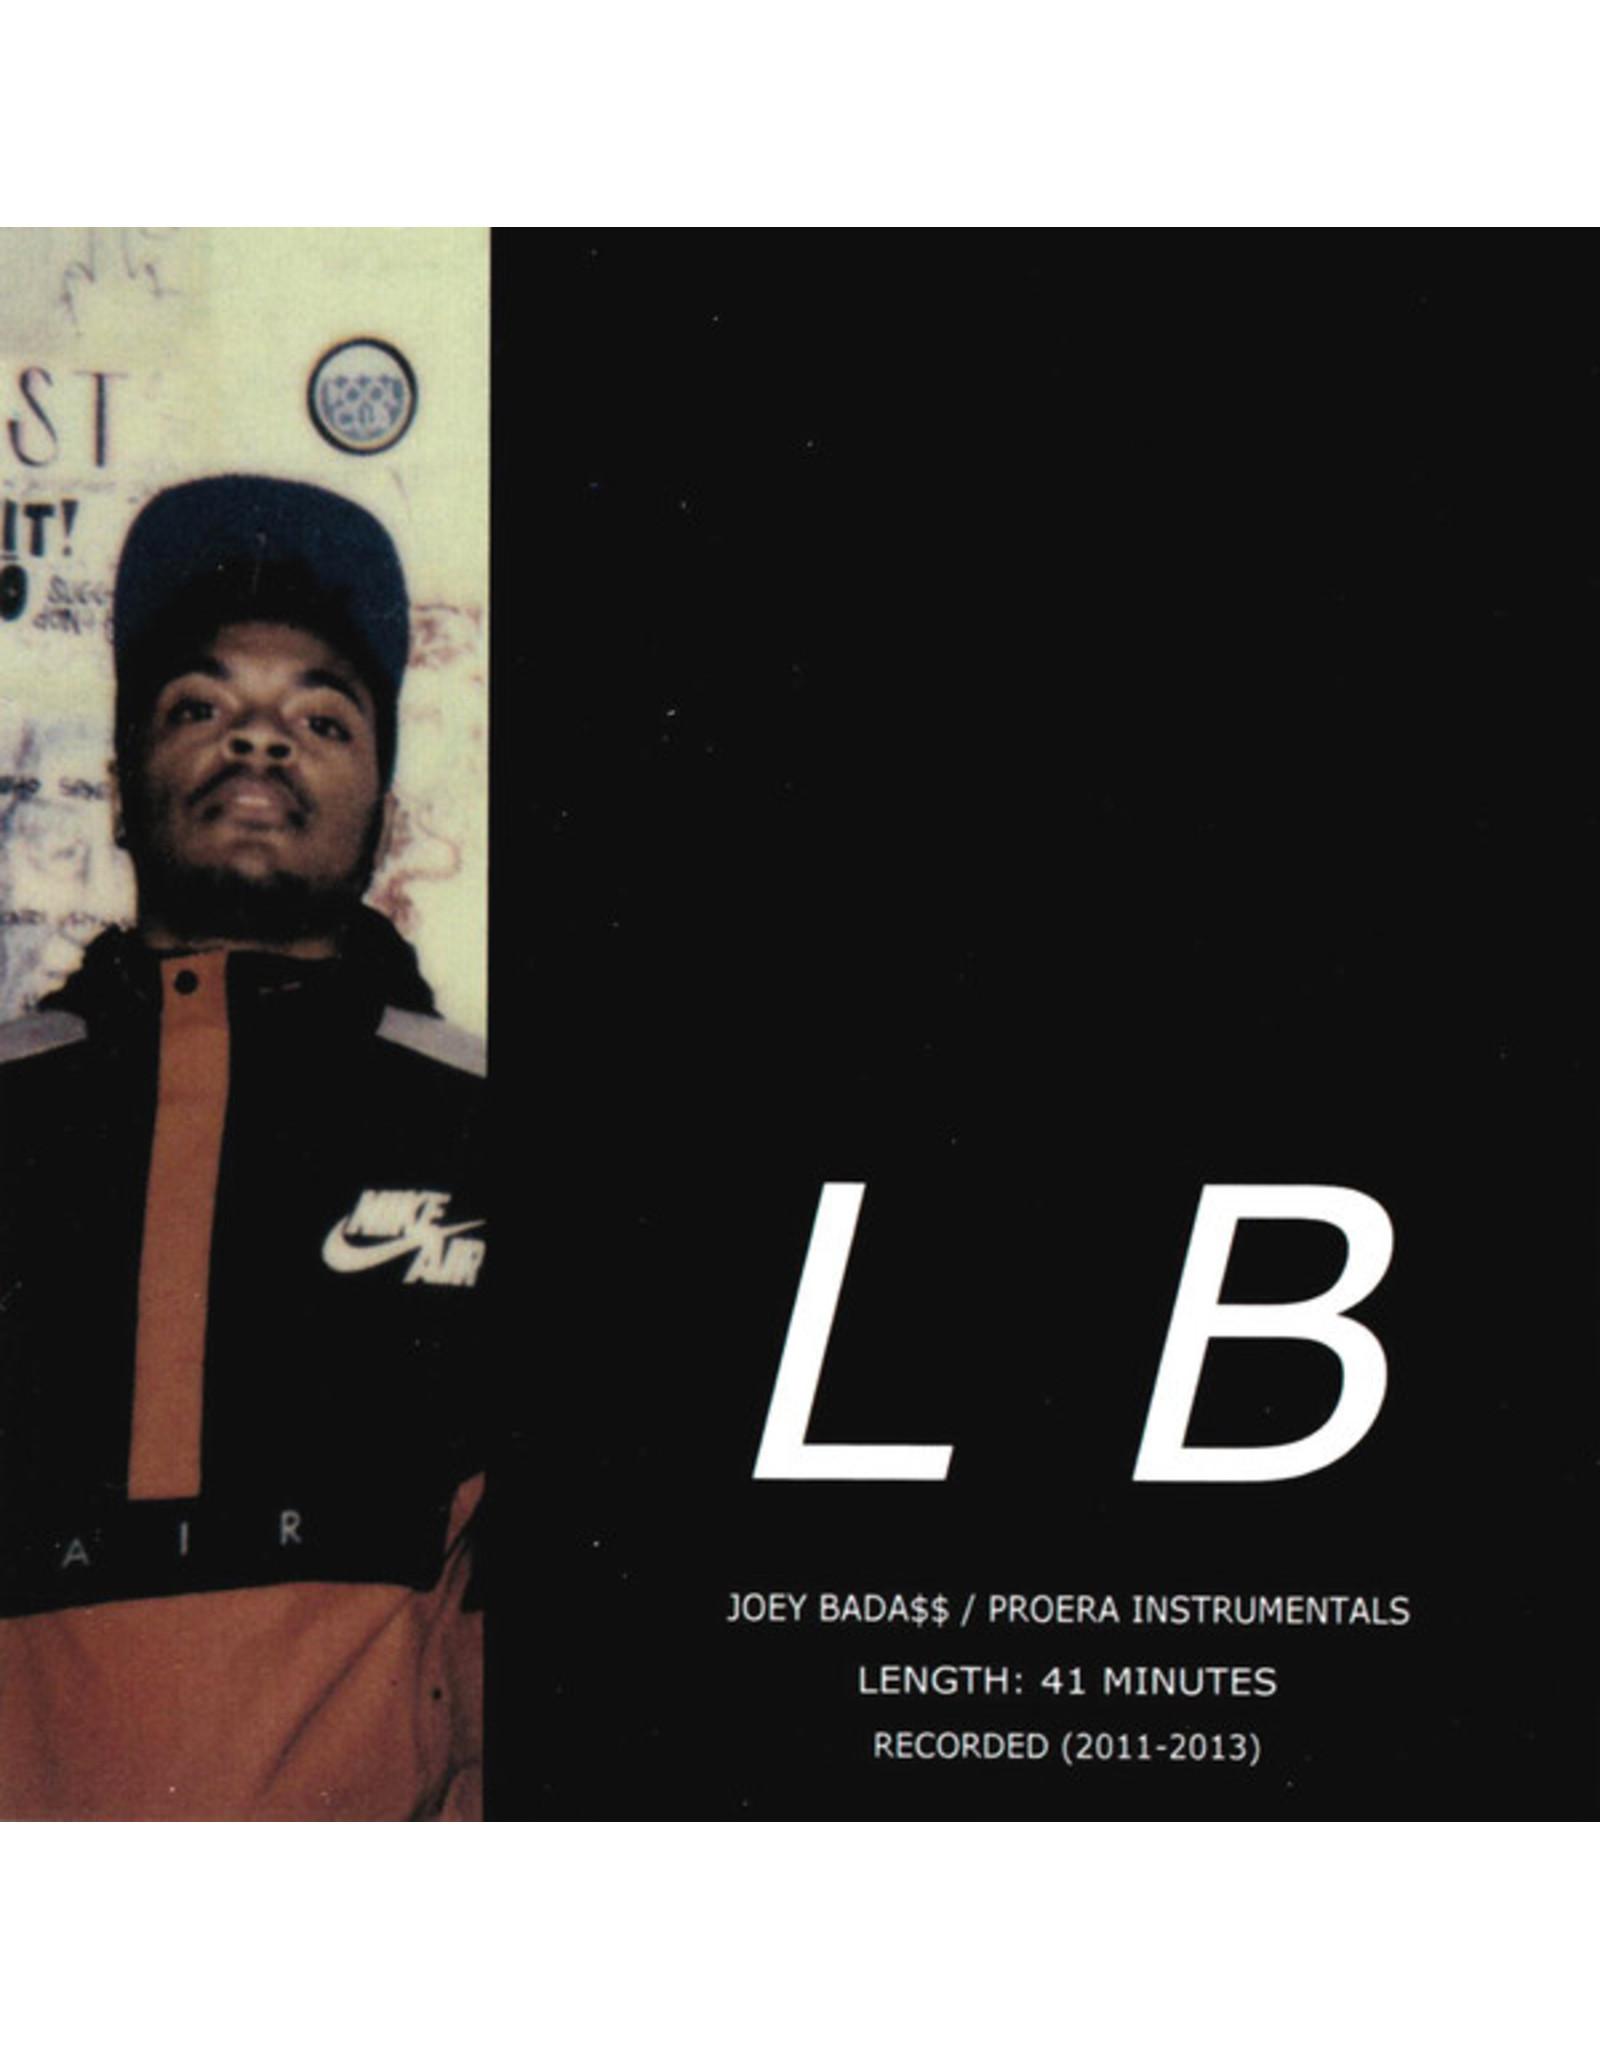 New Vinyl Lee Bannon - Joey Bada$$ / Proera Instrumentals LP